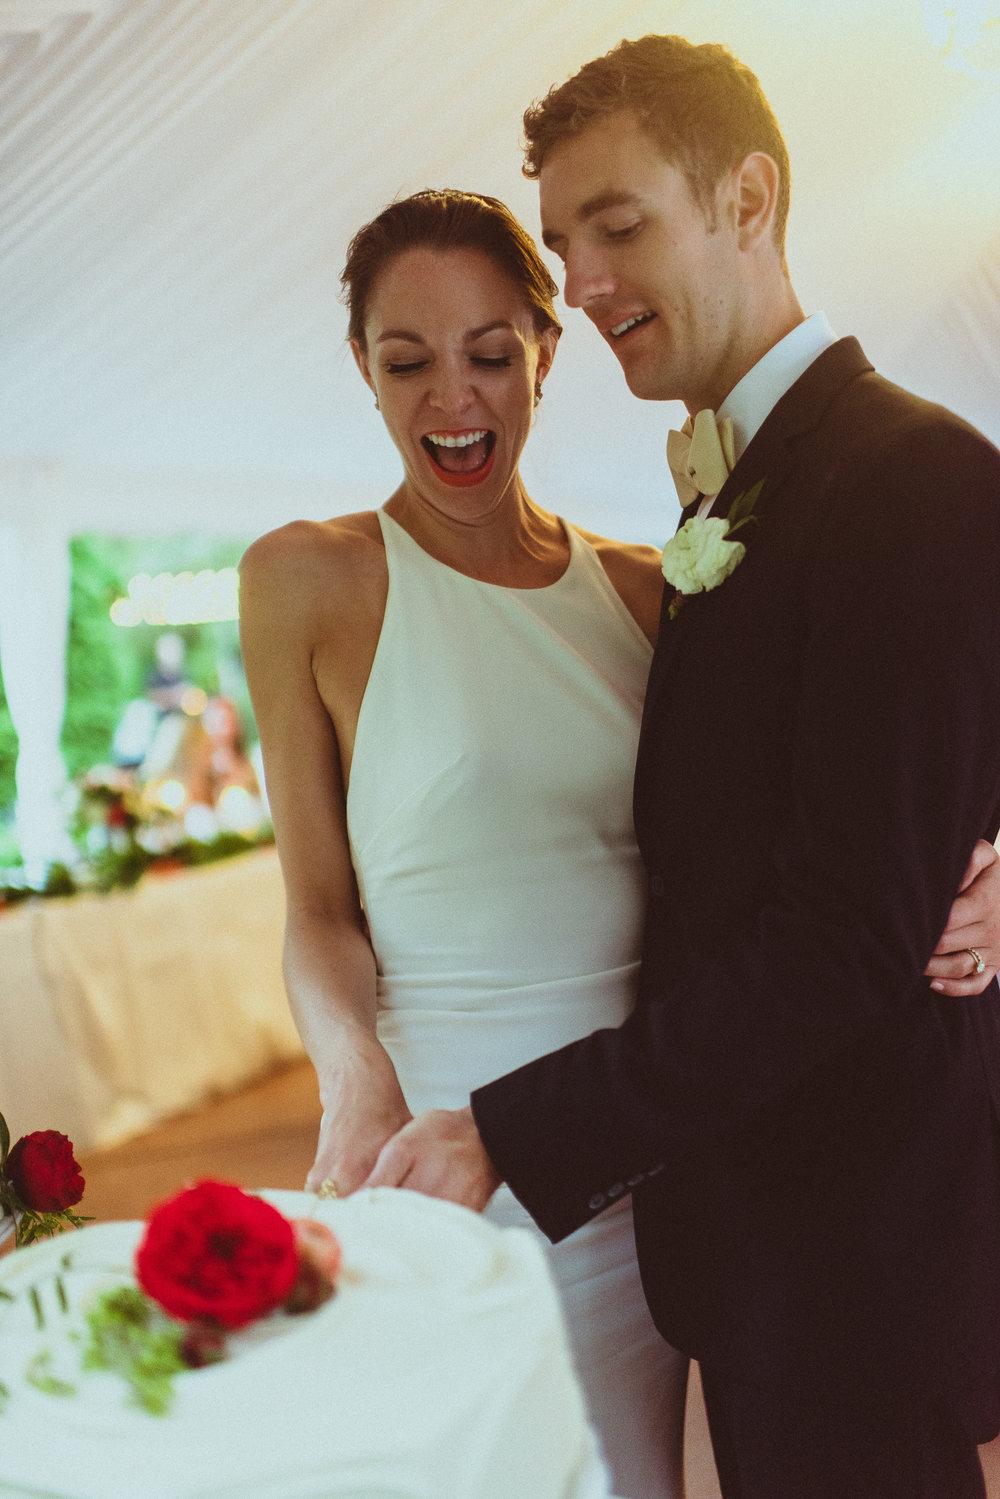 BEST_CHICAG_WEDDING_PHOTOGRAPHER_ZOE_RAIN_-102.jpg